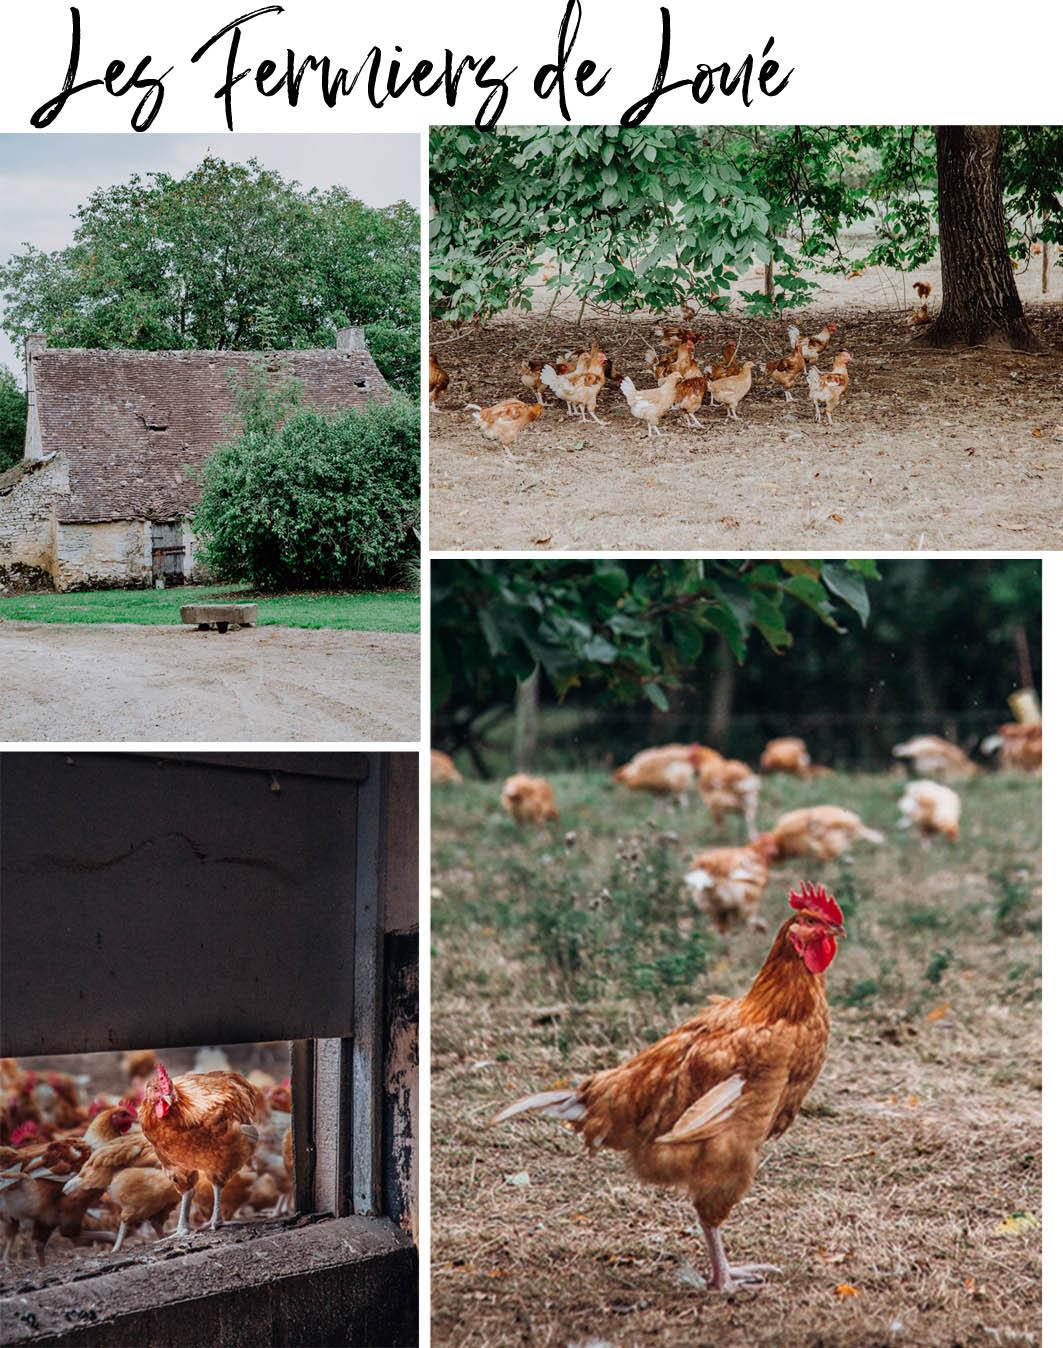 Hühnerhof in Loue